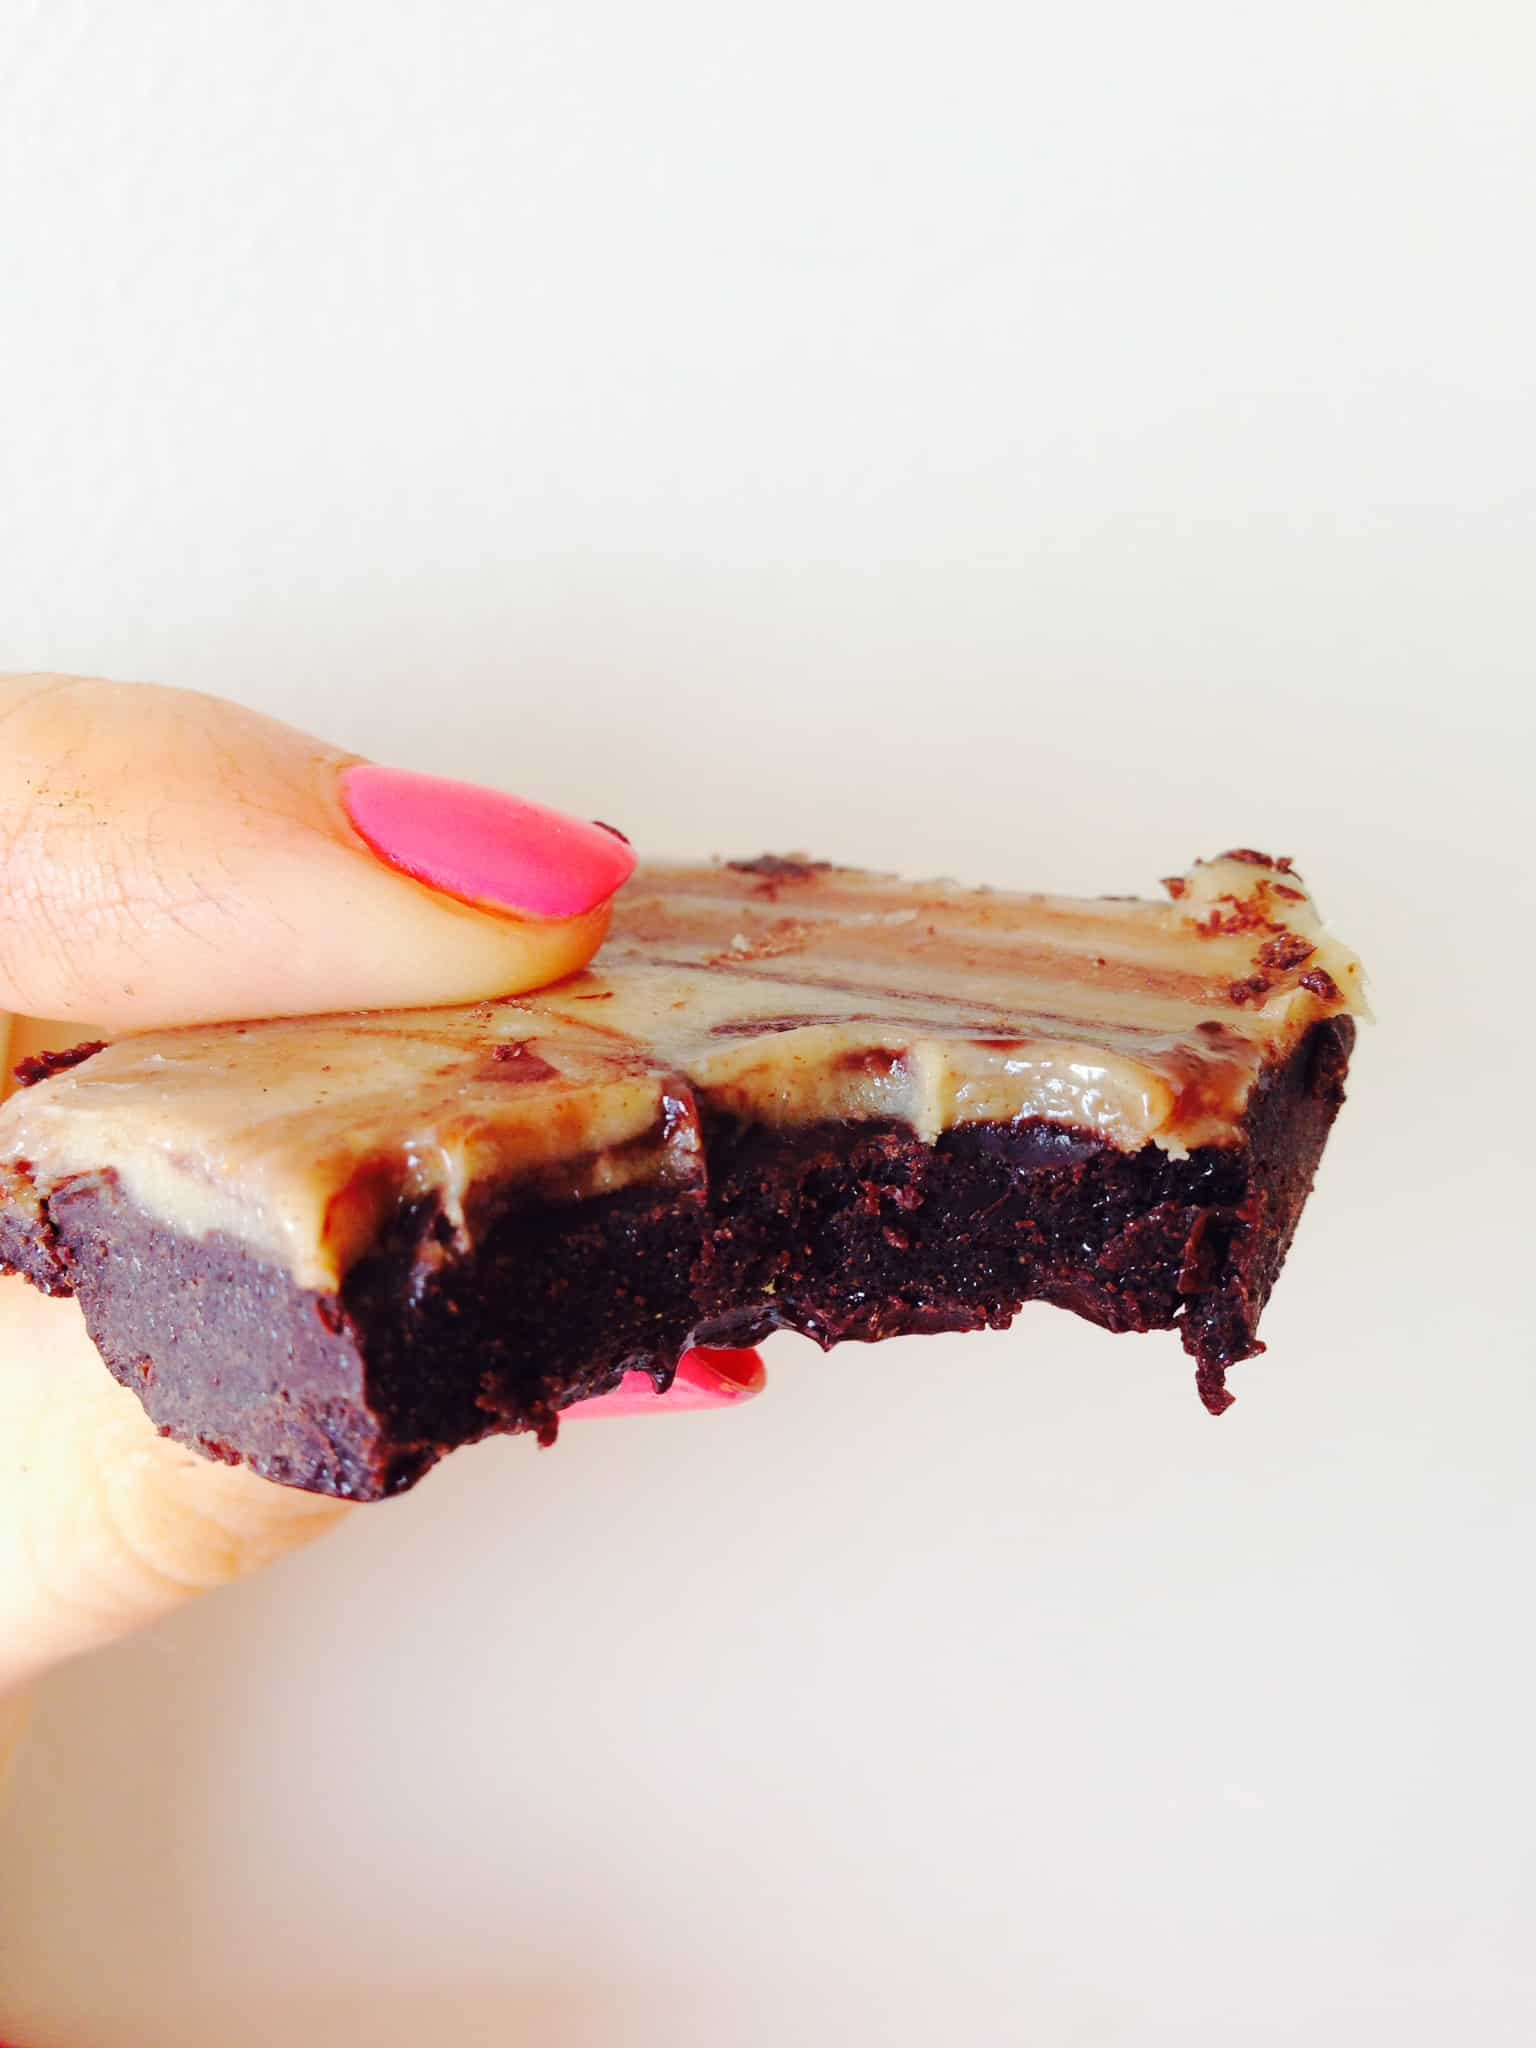 Raw chocolate recipe 1